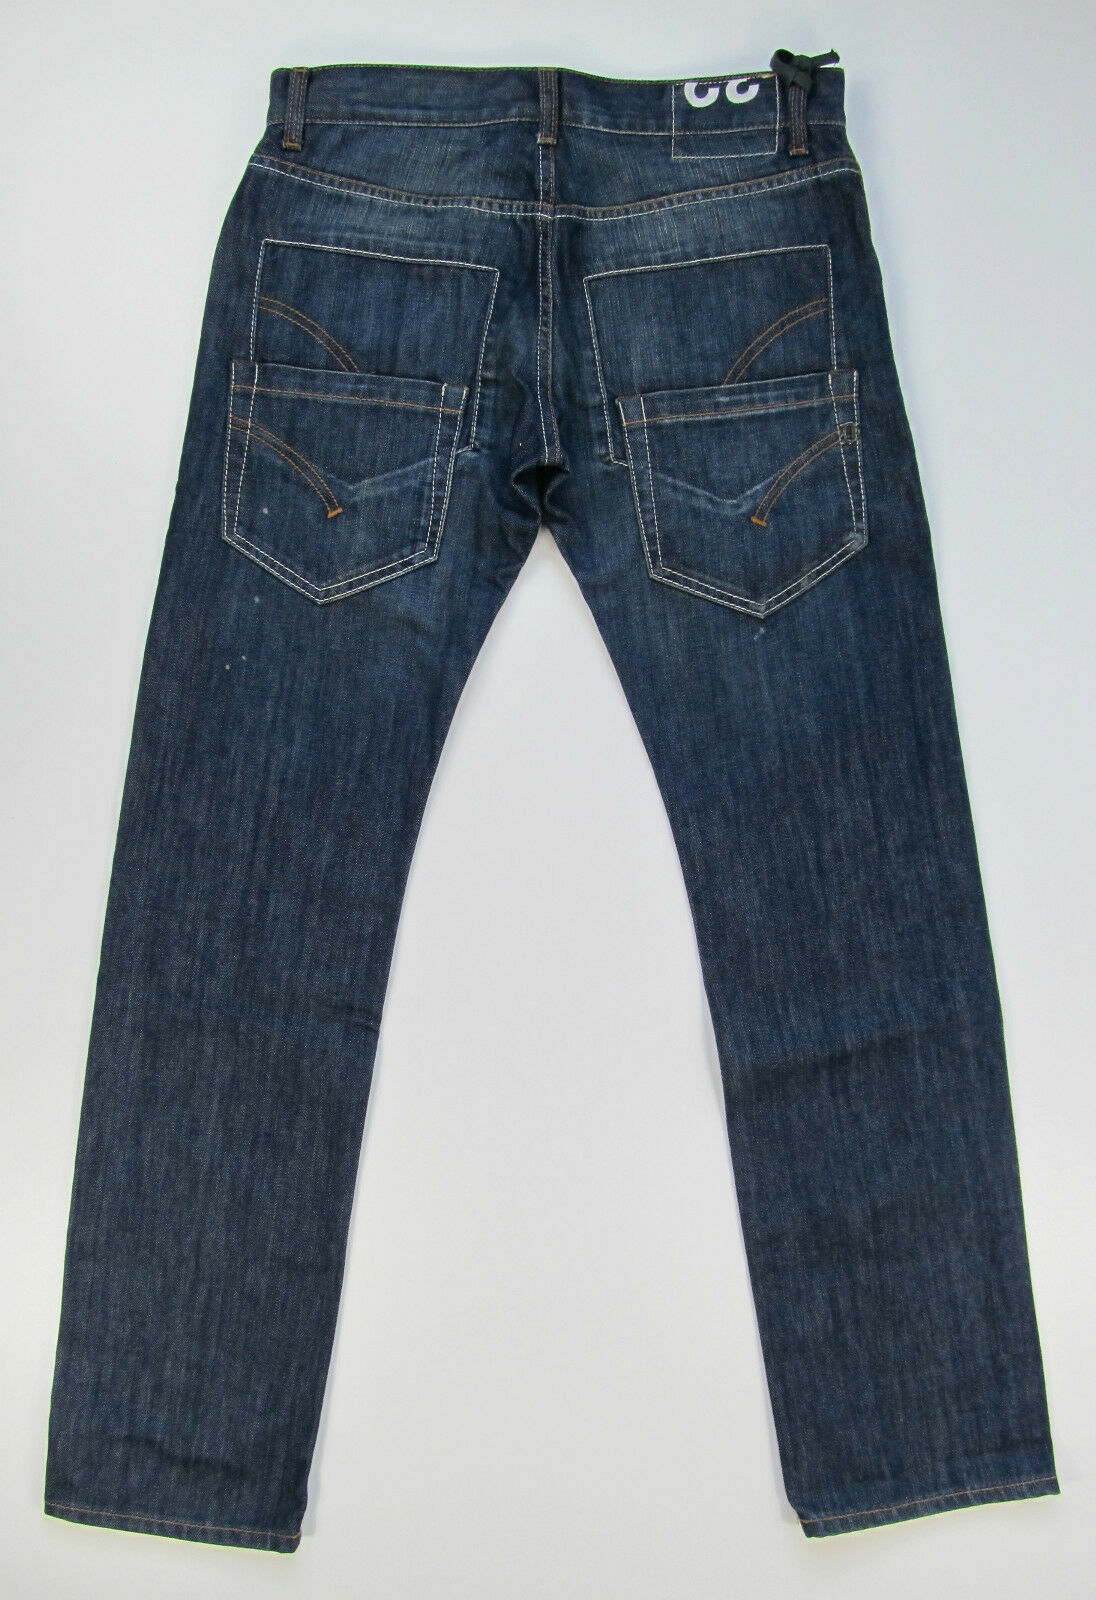 Dondup Hose Hose Hose Denim Jeans Hose UP172 Pantalone Cloid Blau Neu | Verpackungsvielfalt  | Attraktives Aussehen  348ea0